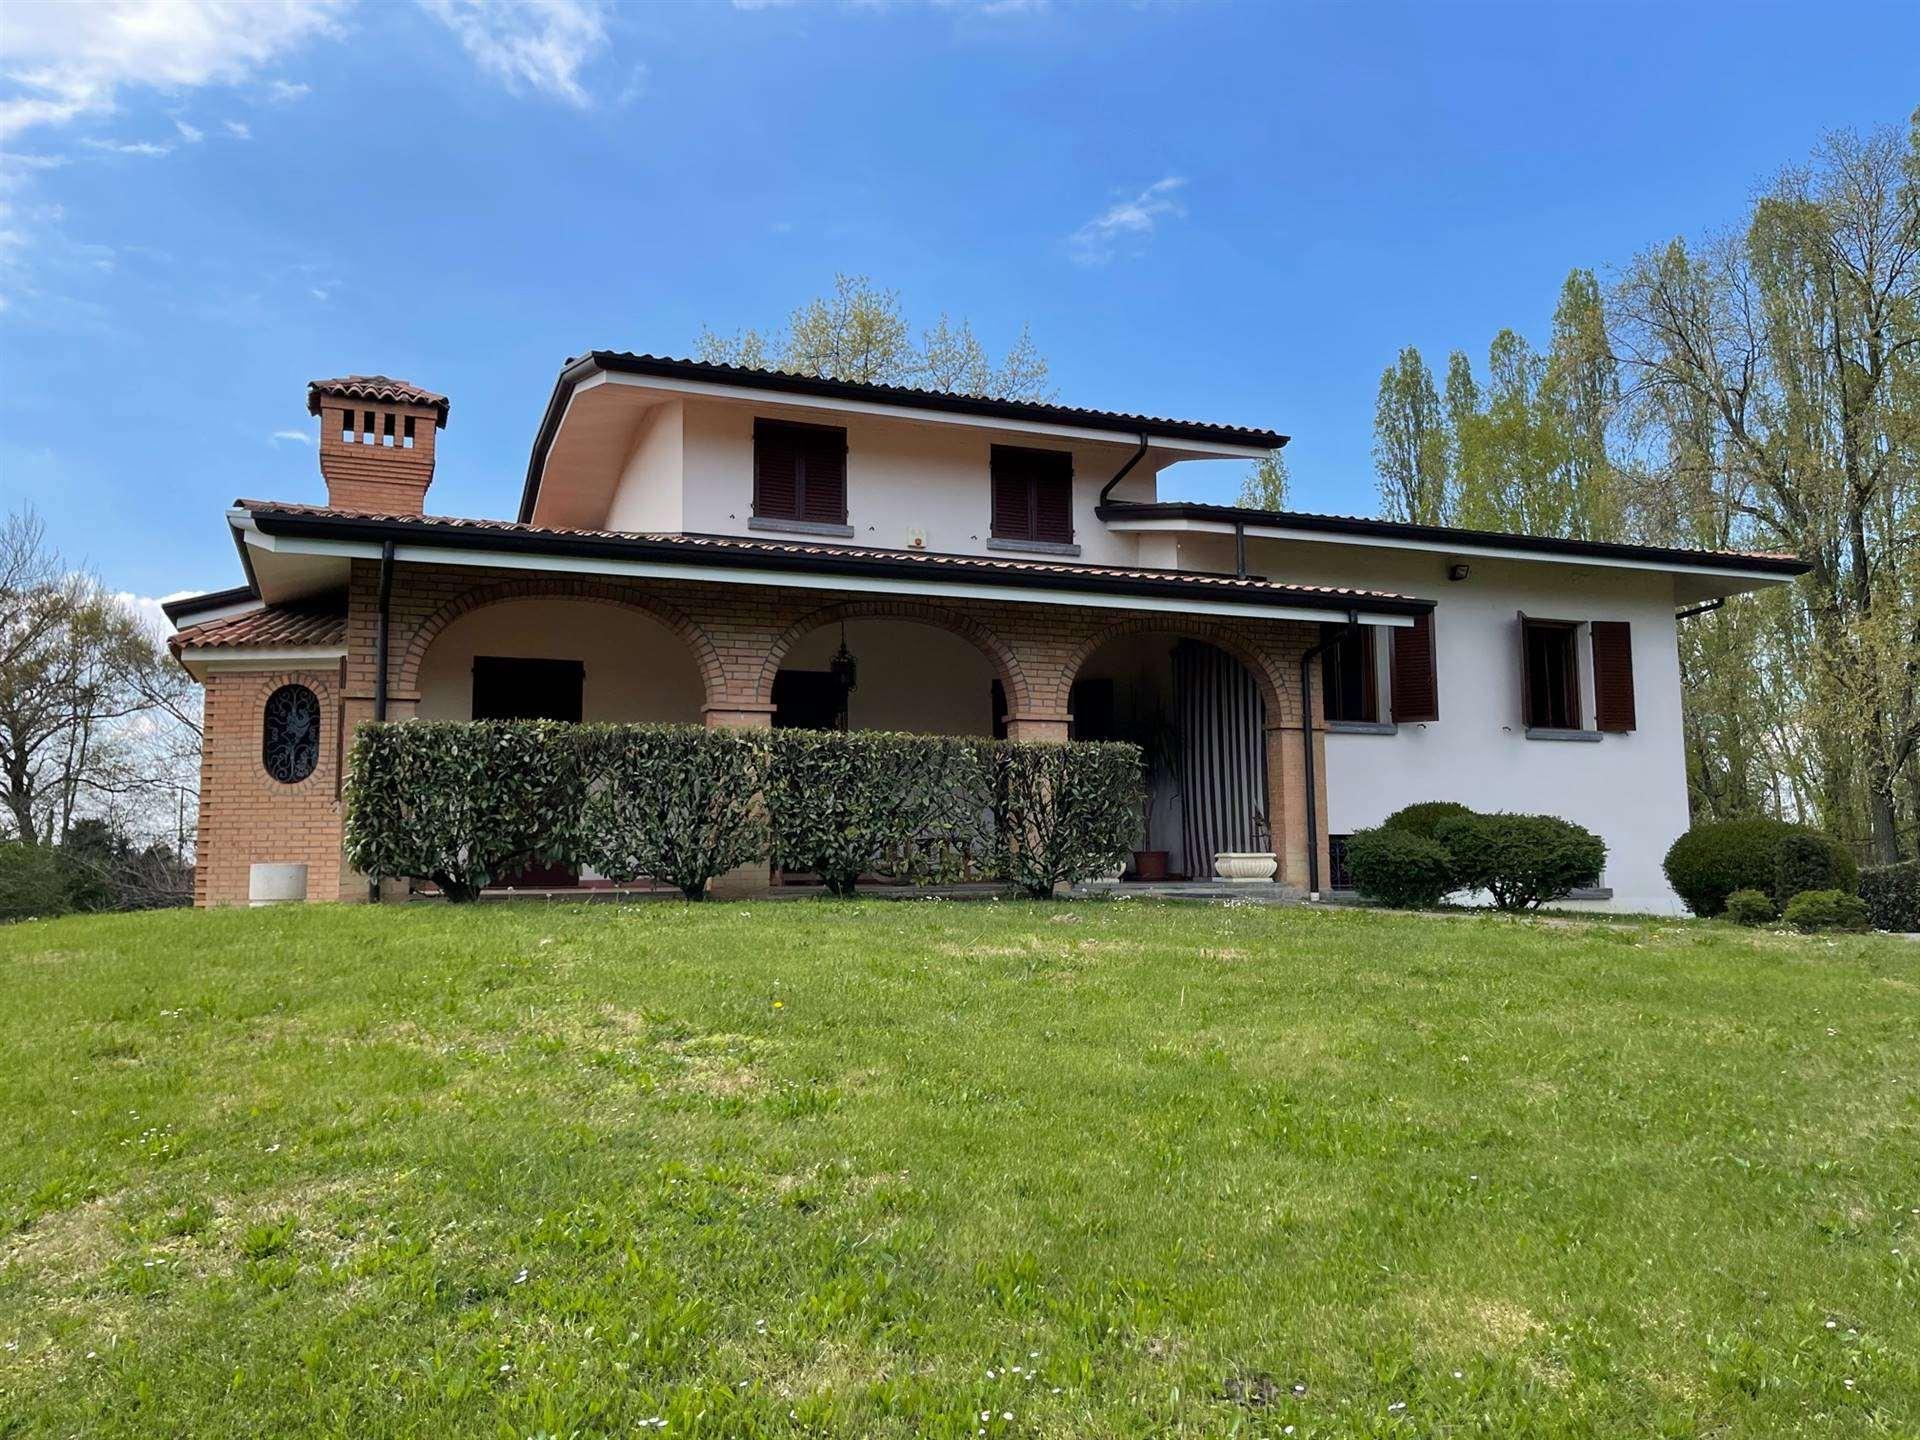 esterno villa singola Zelarino euro 550.000